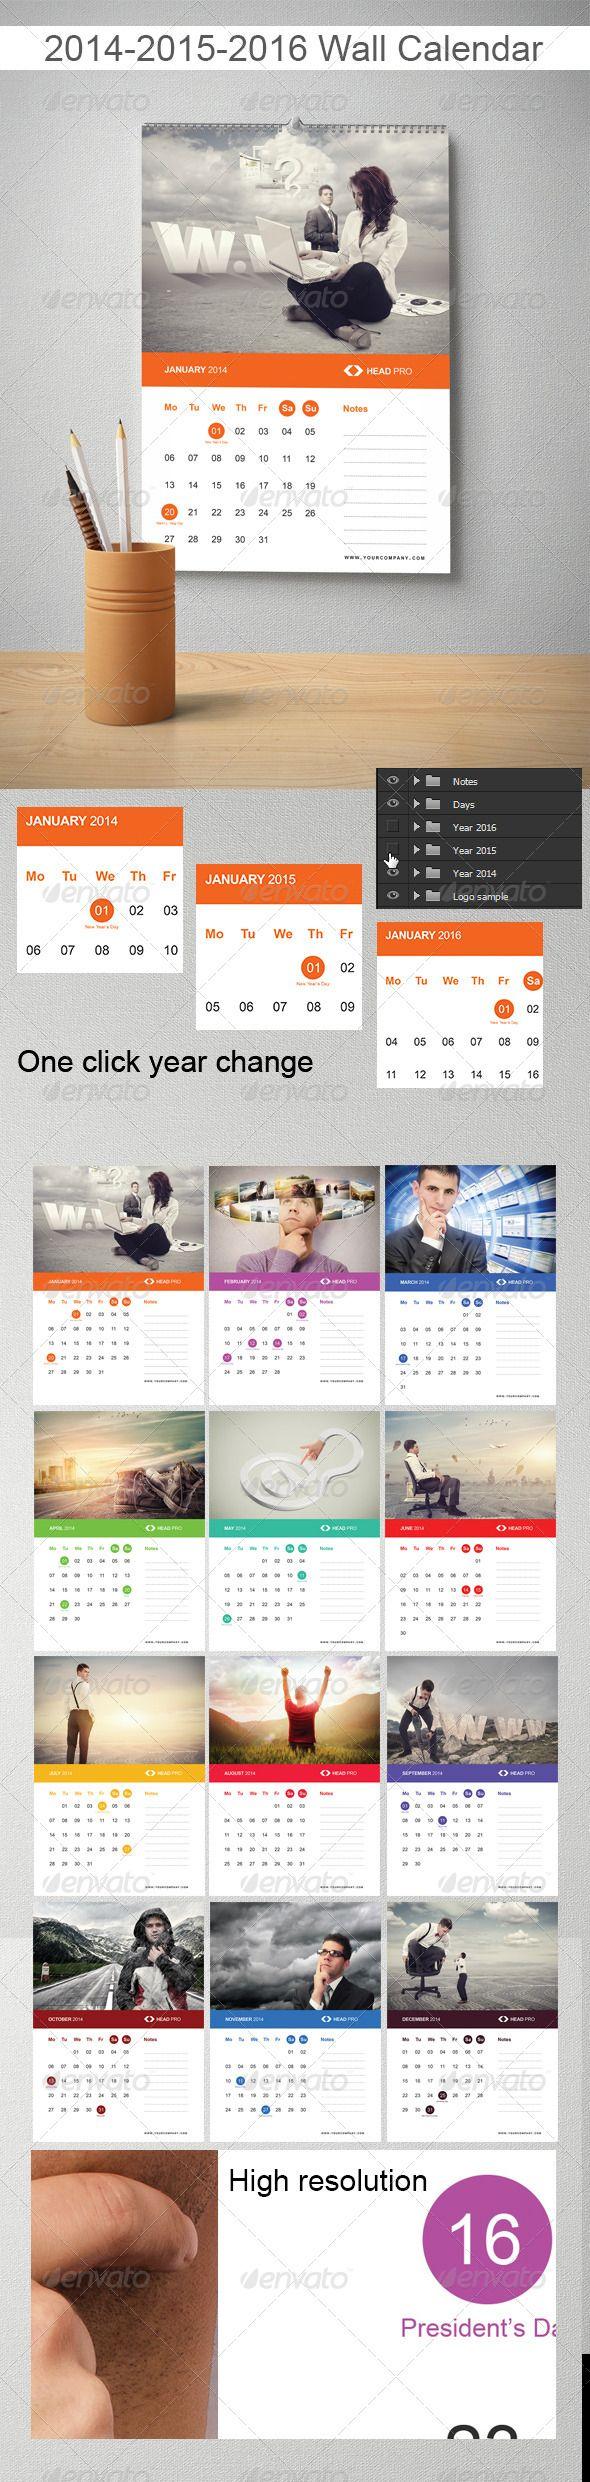 2014 2015 2016 Wall Calendar - Calendars Stationery